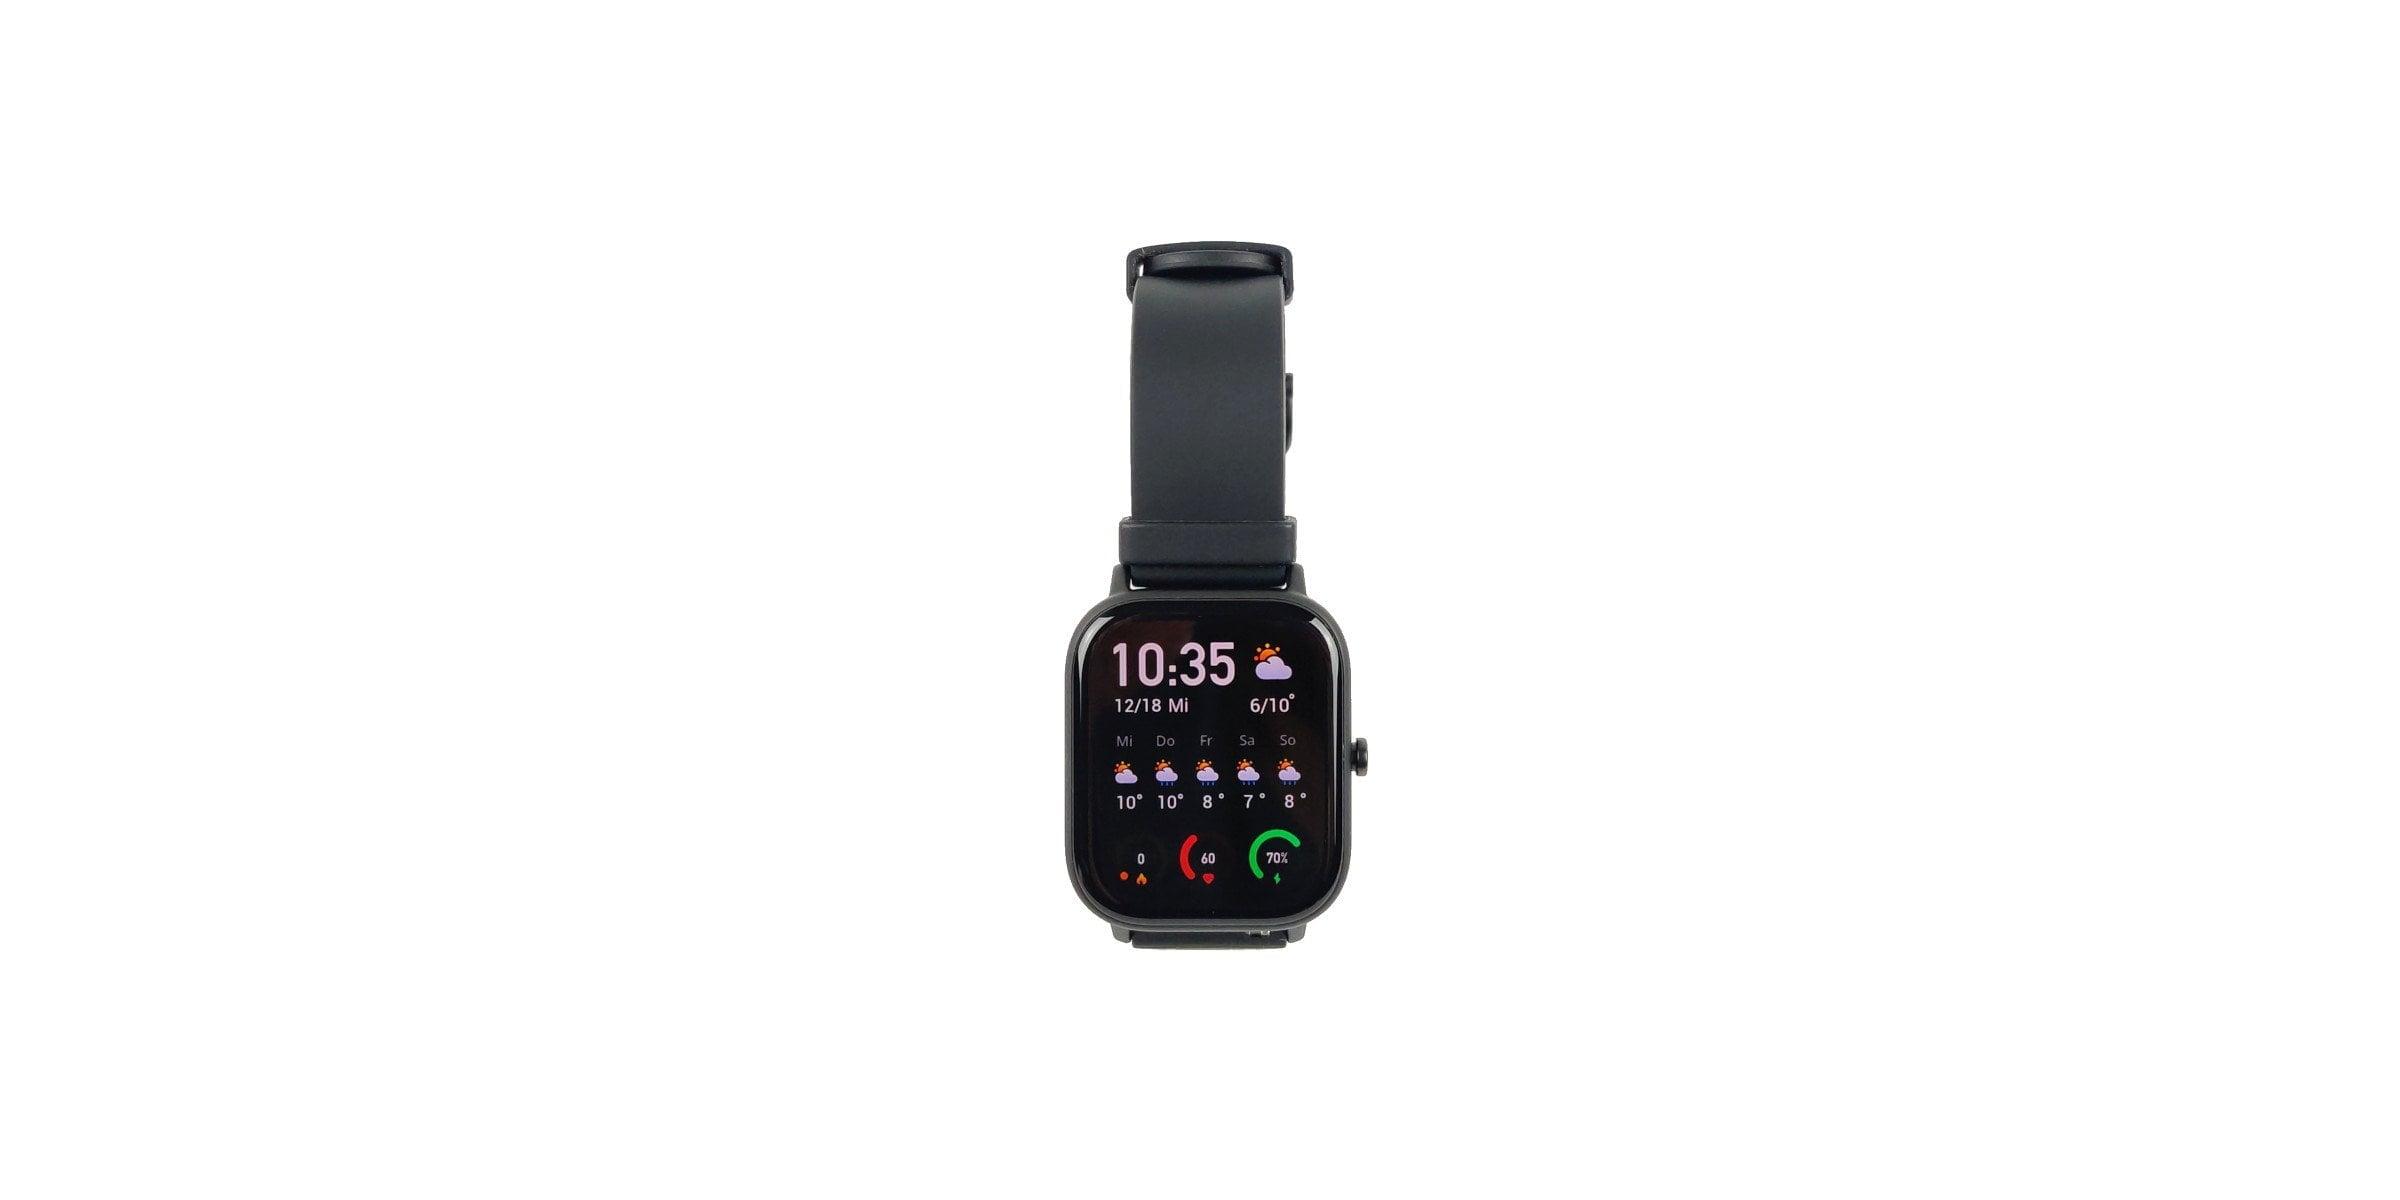 Amazfit GTS Smartwatch Review